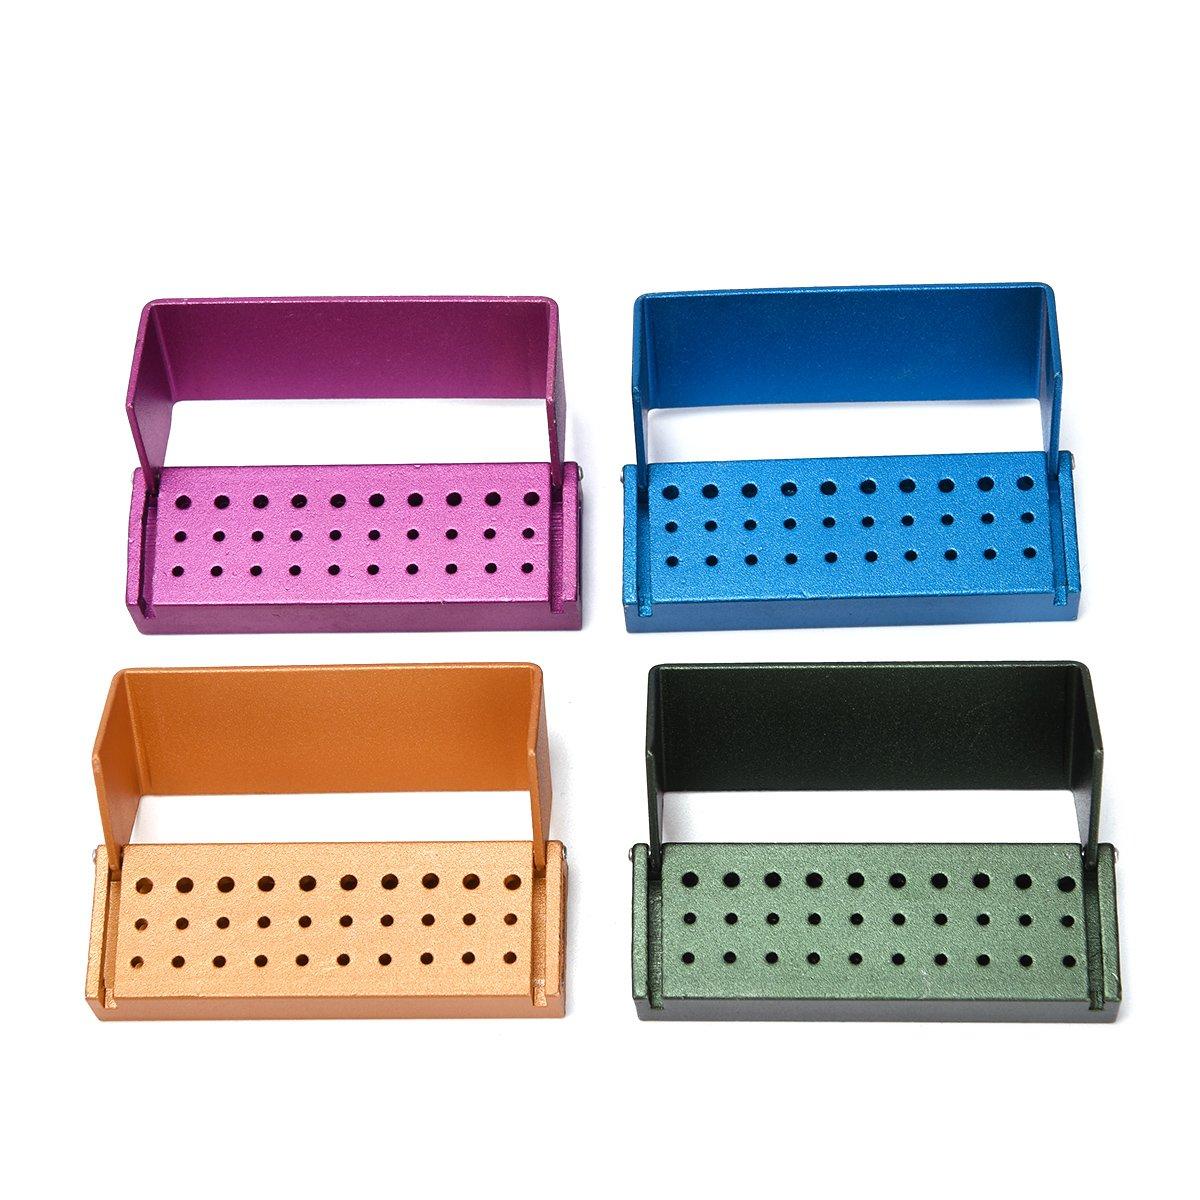 Annhua Dental 30-Hole Bur Block File Holder Organizer with Random Colour